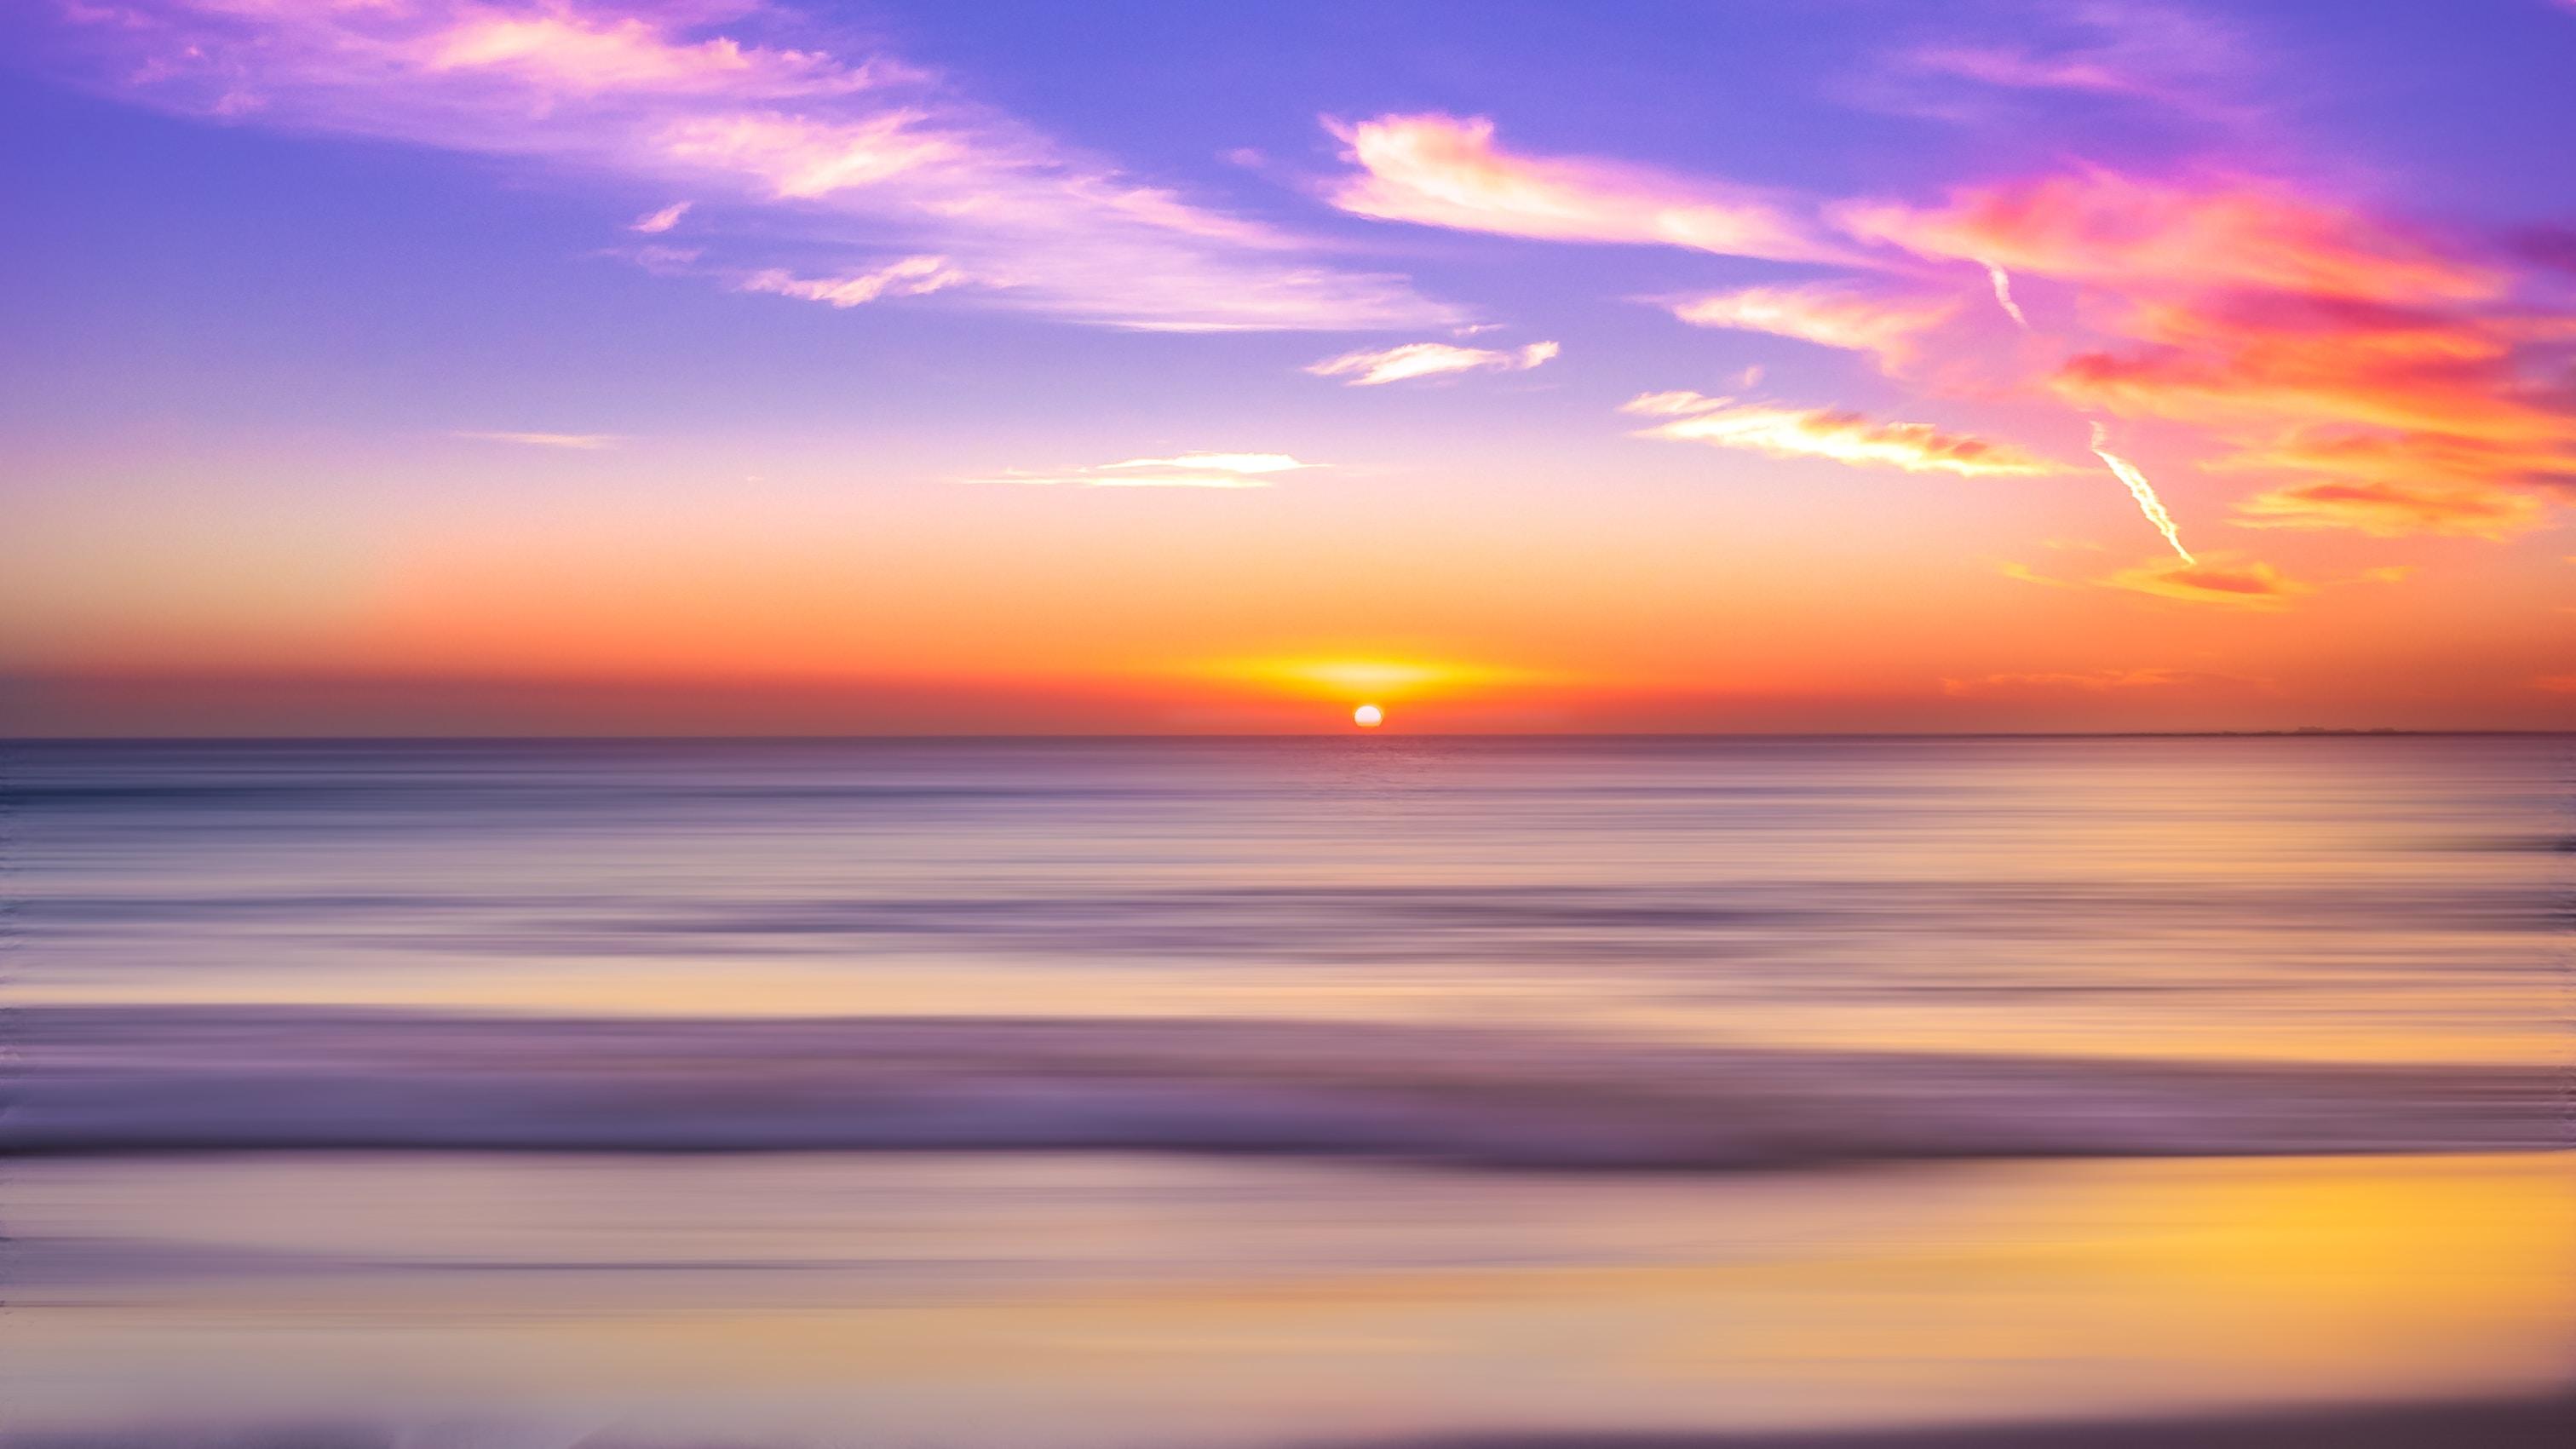 seashore during sunset